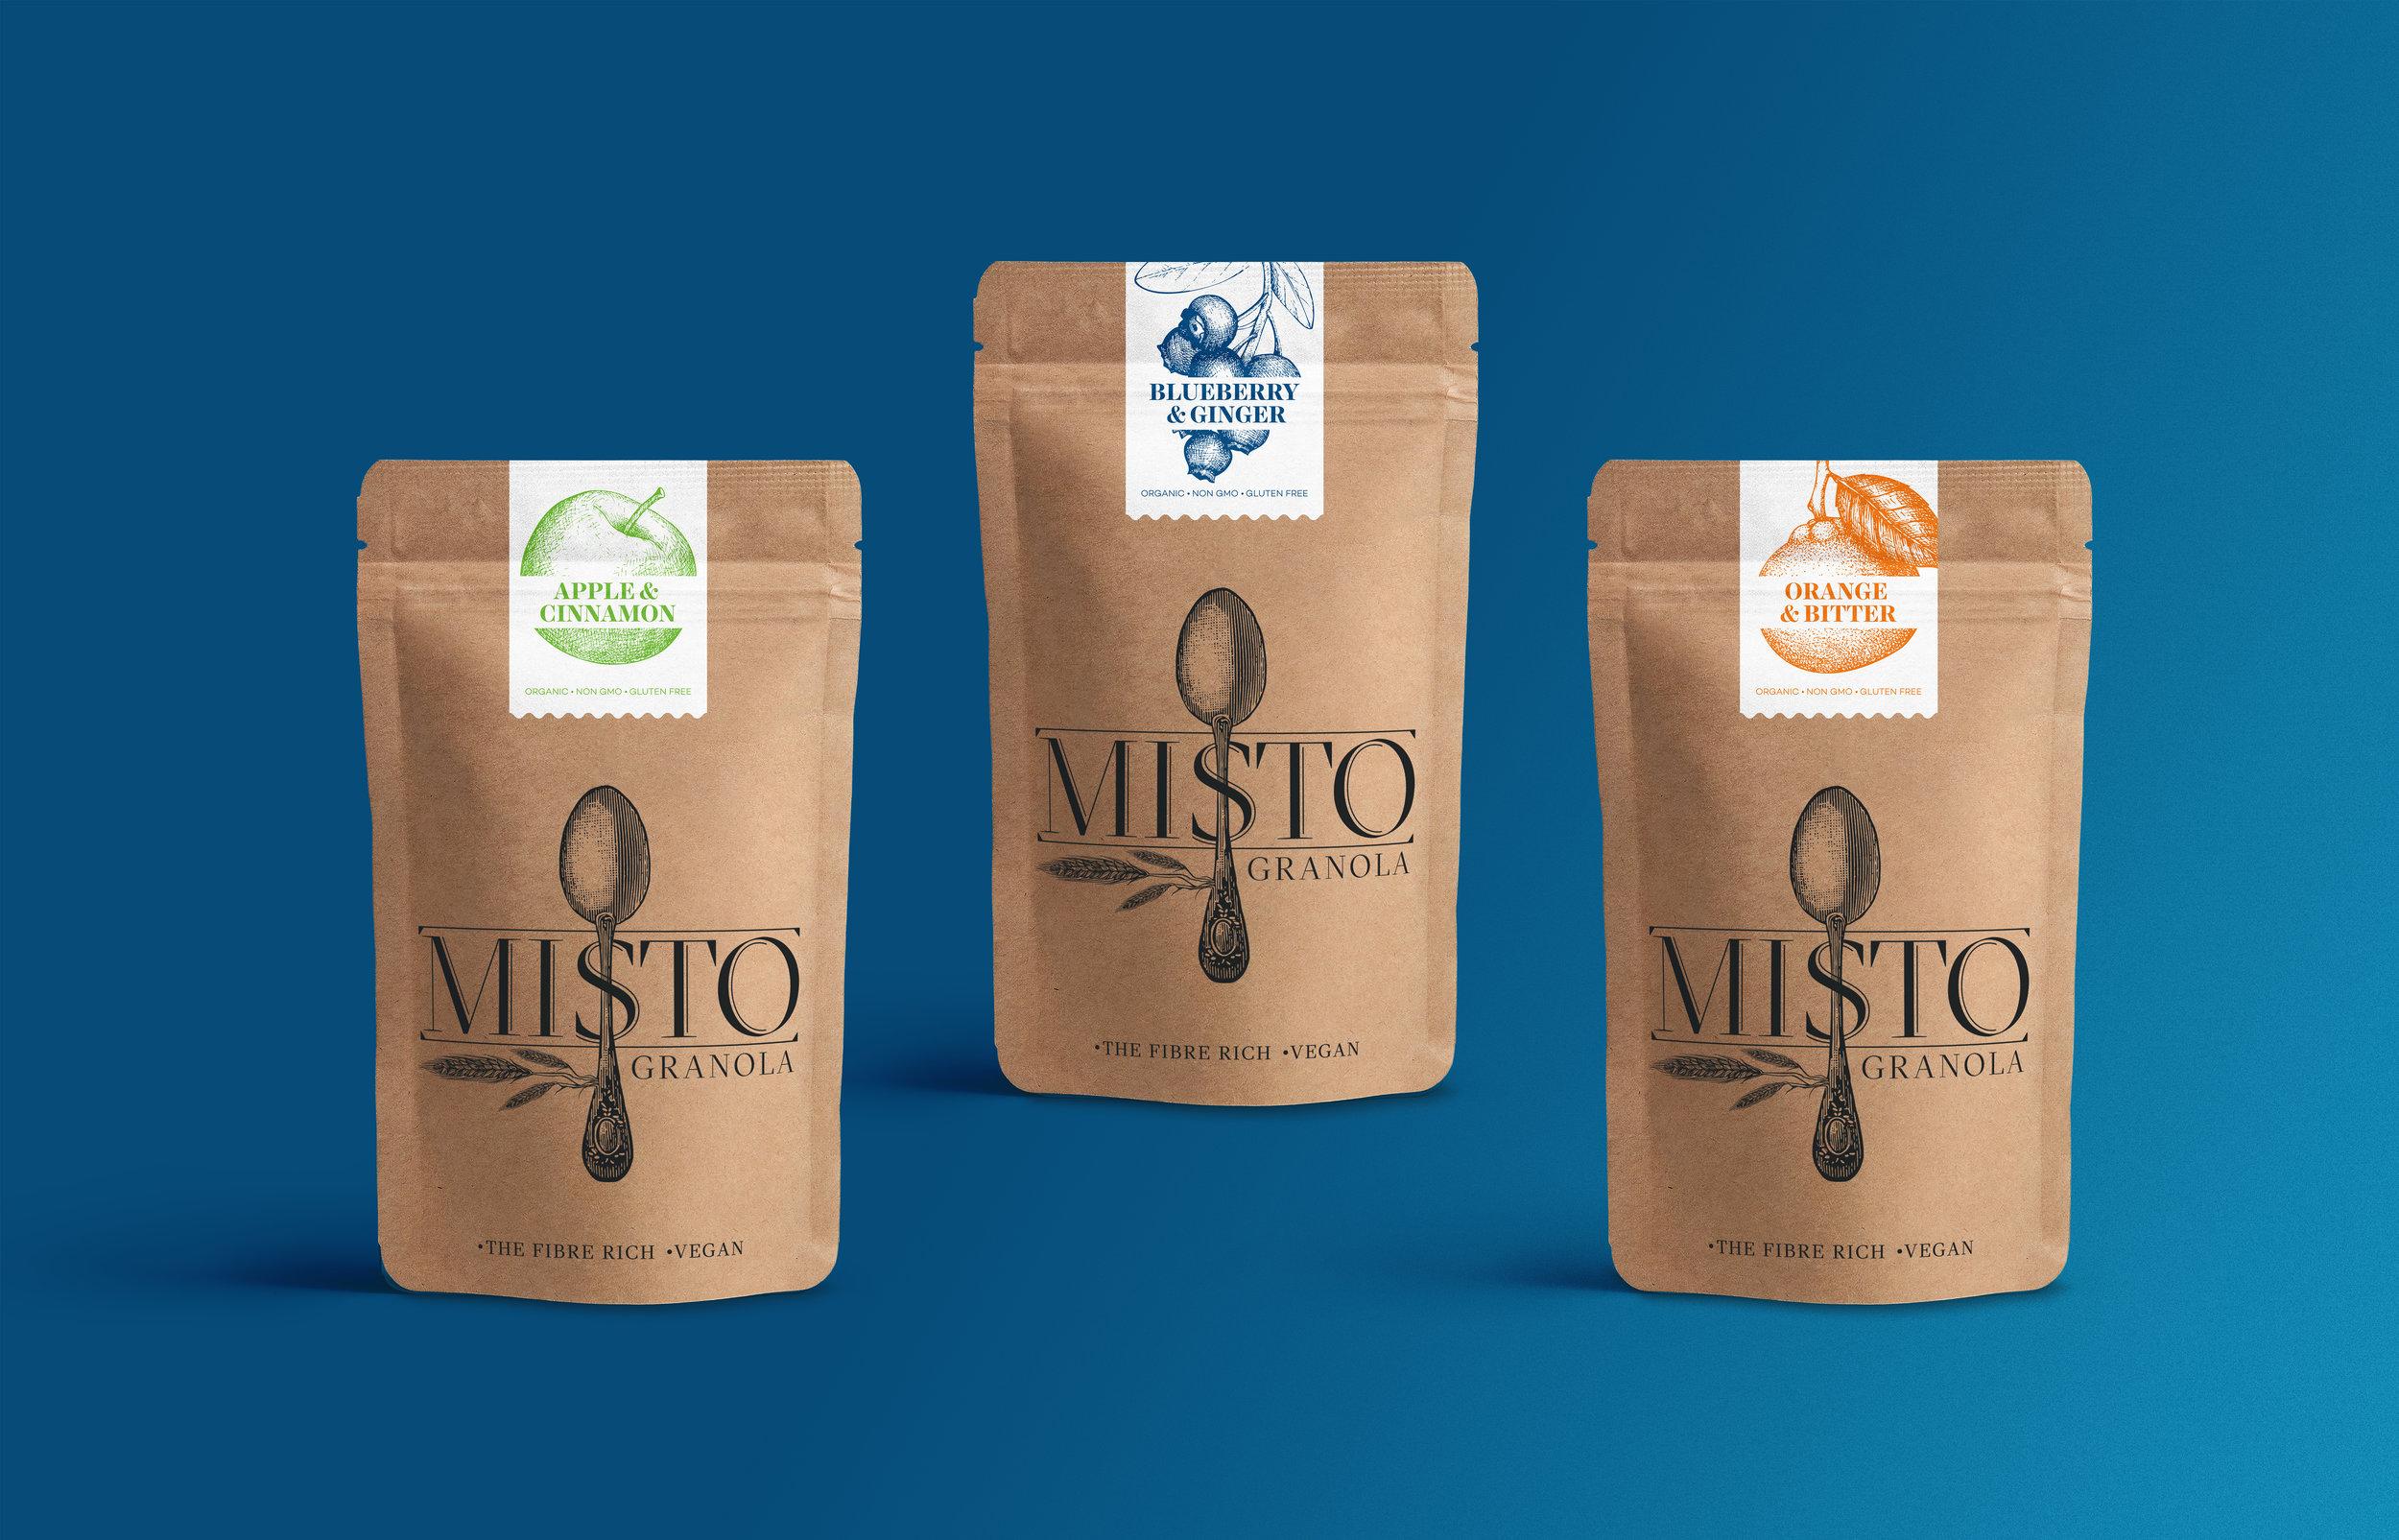 misto granola packaging design gokce sen